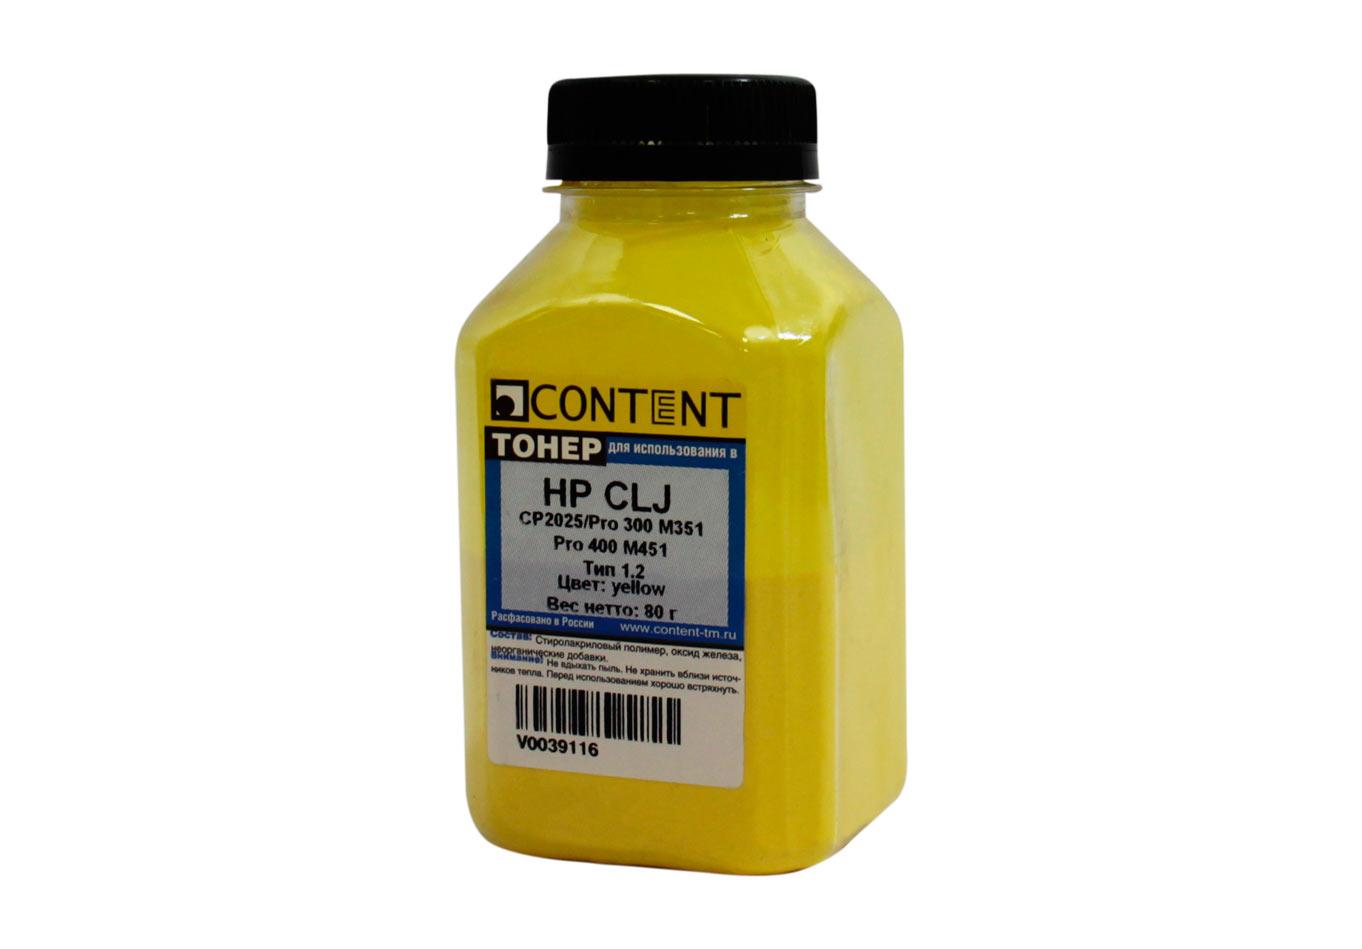 Тонер Content для HP CLJ CP2025/Pro 300 M351/Pro 400 M451, Тип 1.2, Y, 80 г, банка